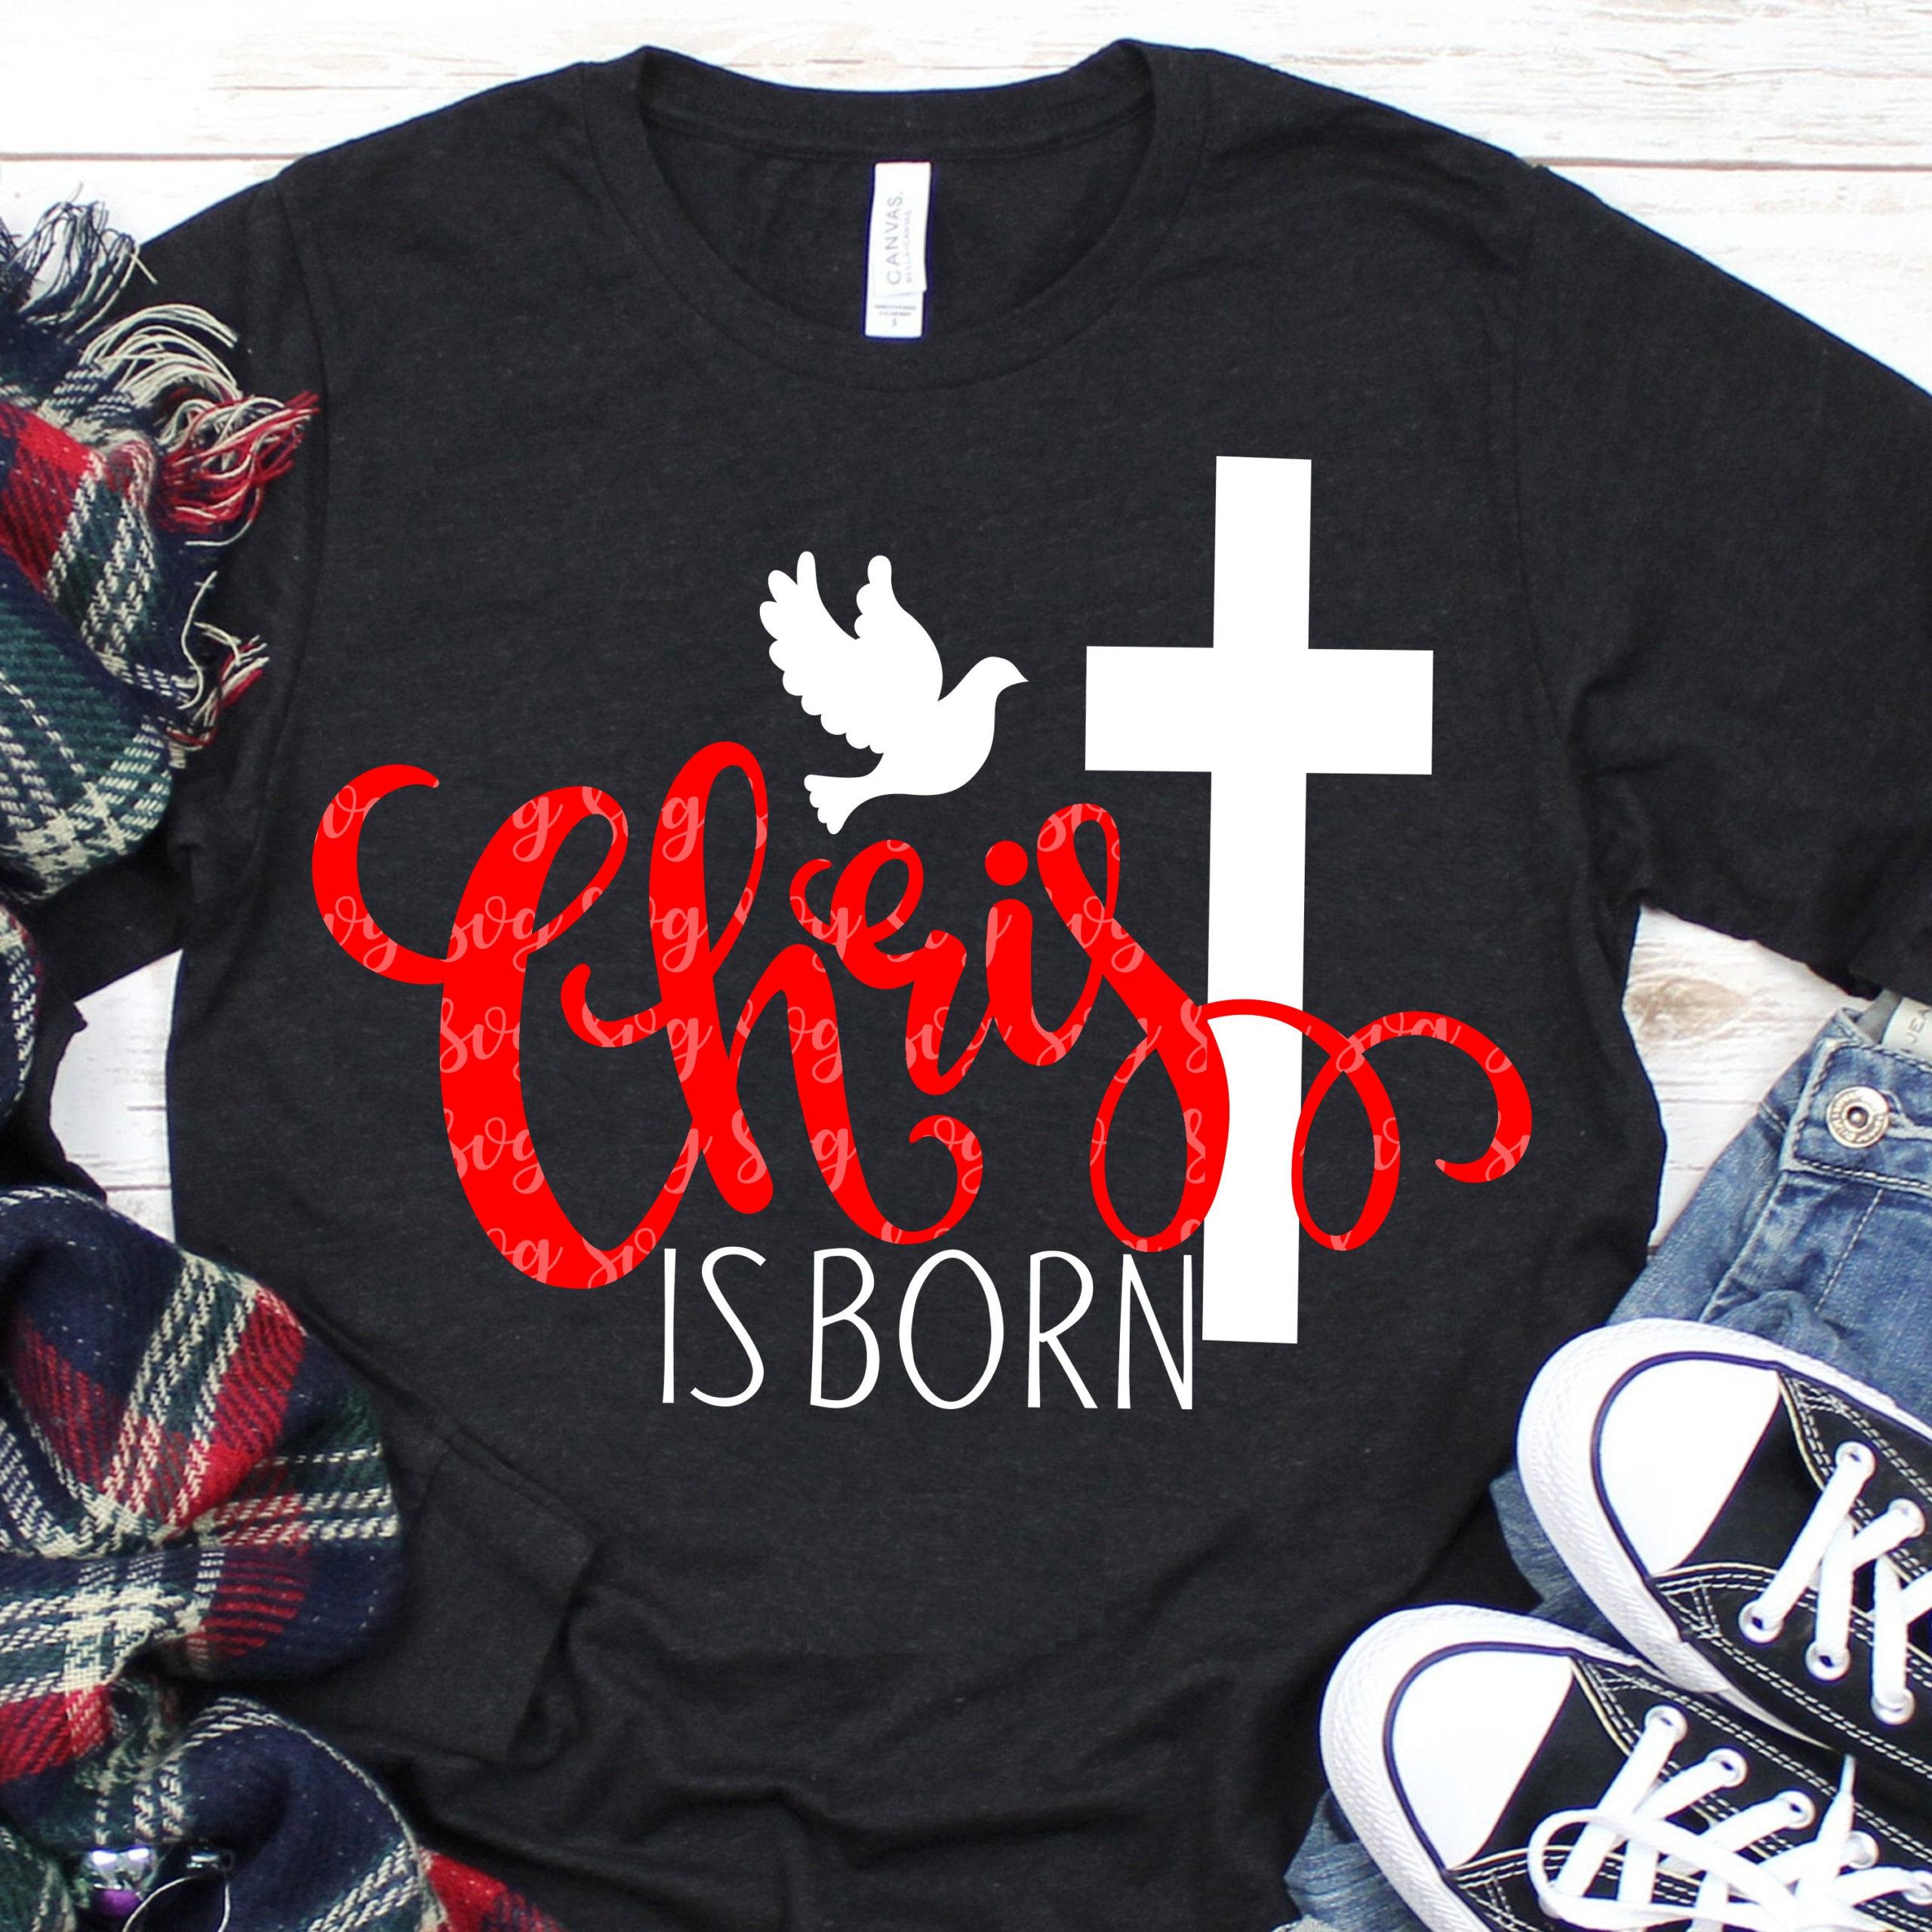 Christ Is Born Svg Christmas Svg Jesus Svg Svg Dxf Eps Cross Svg Cut Files Iron On Cutter File Quote Svg For Cricut Christ Svg Svg For Cricut